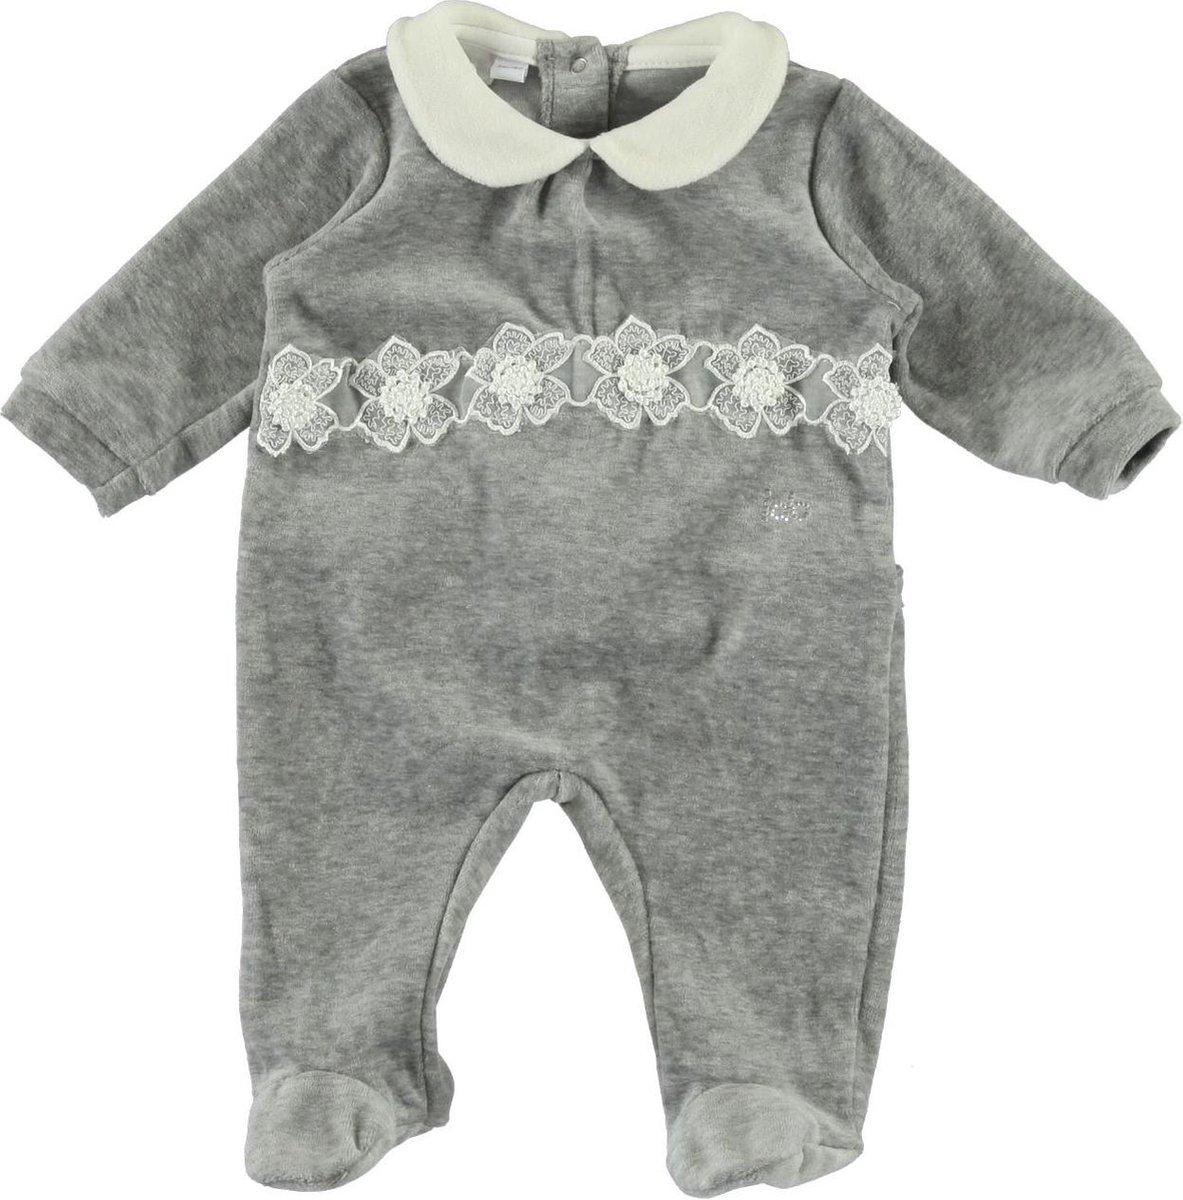 Pyjama met dessin voor babymeisjes | Petit Bateau